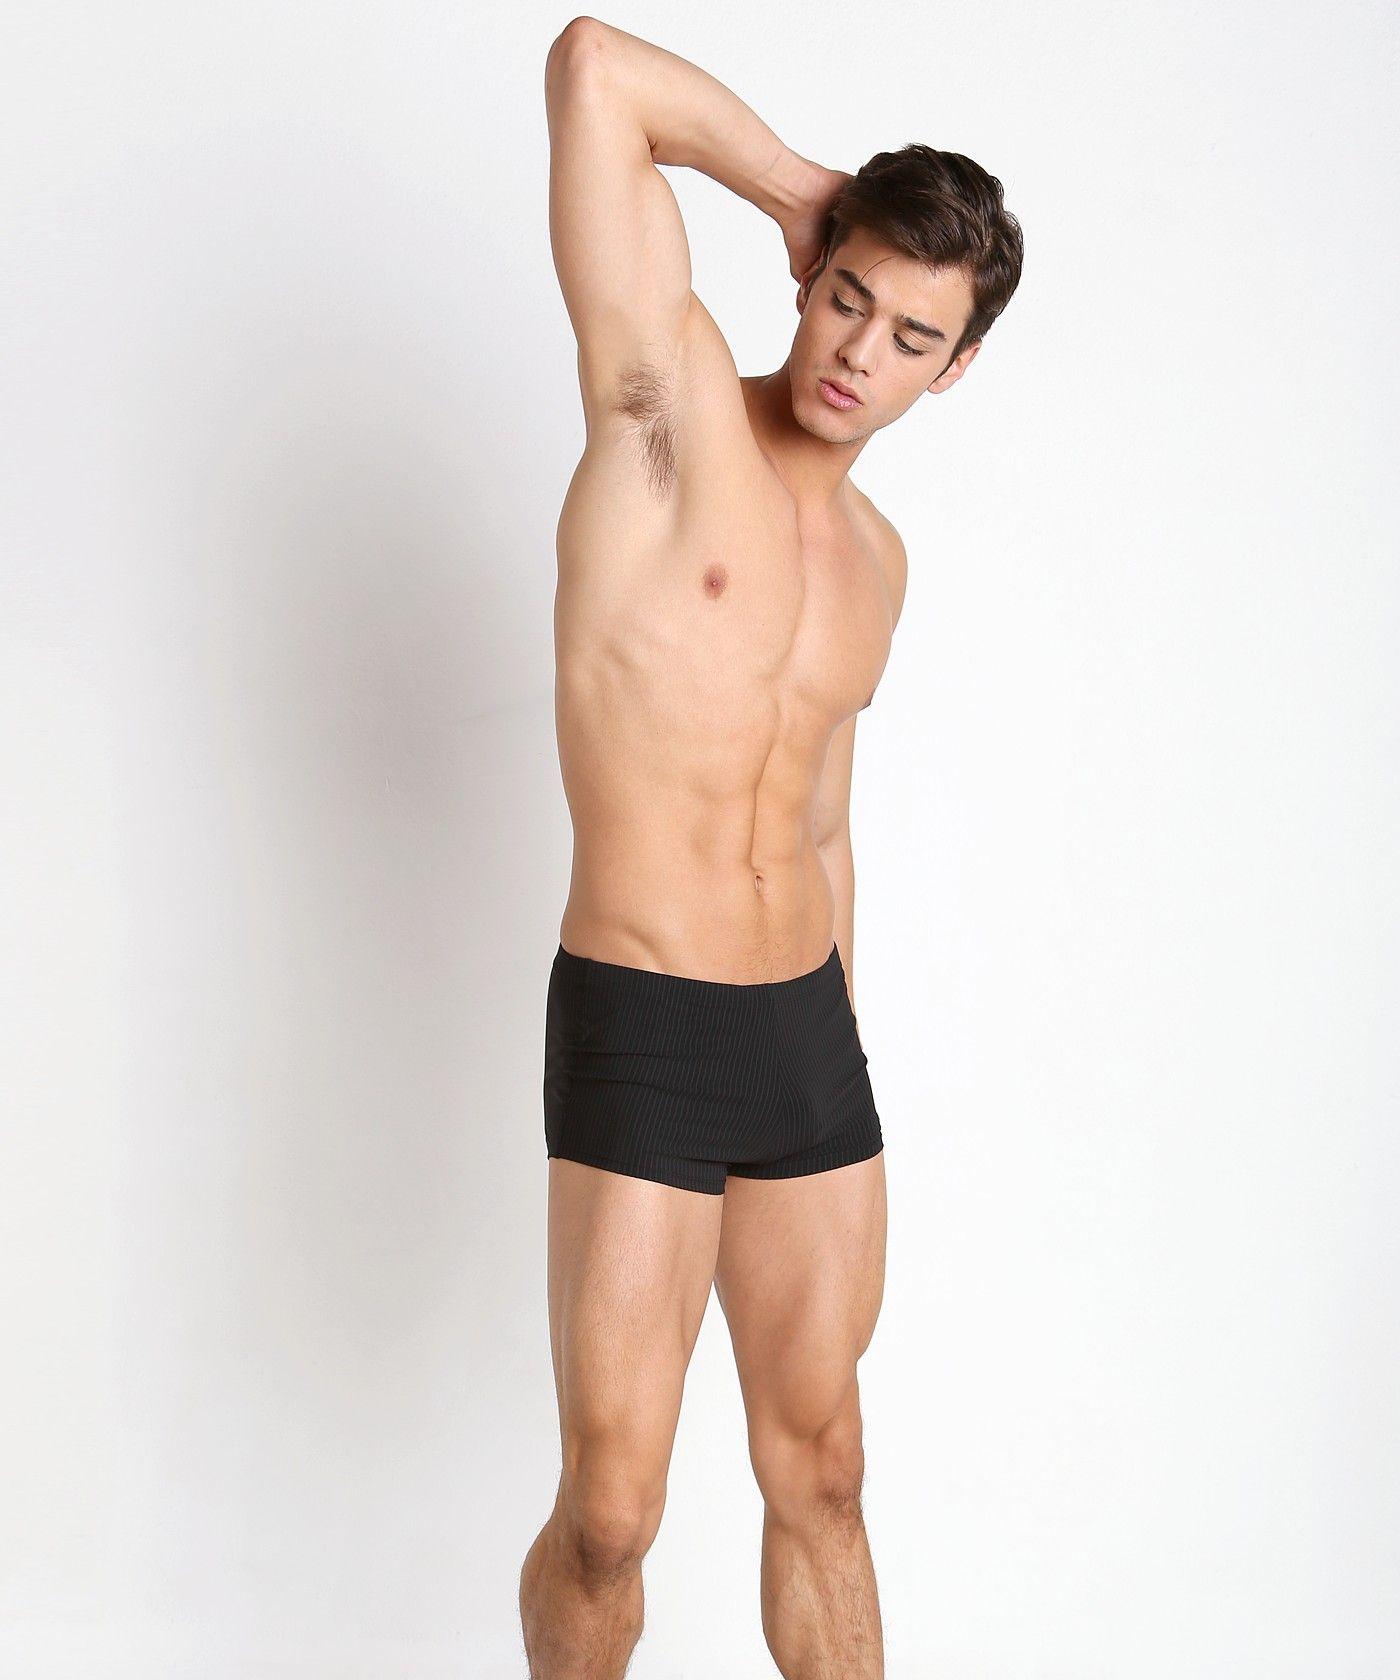 c526d4cb Hugo Boss Tilefish Swim Trunk Black 50296049-006 at International Jock  Underwear & Swimwear